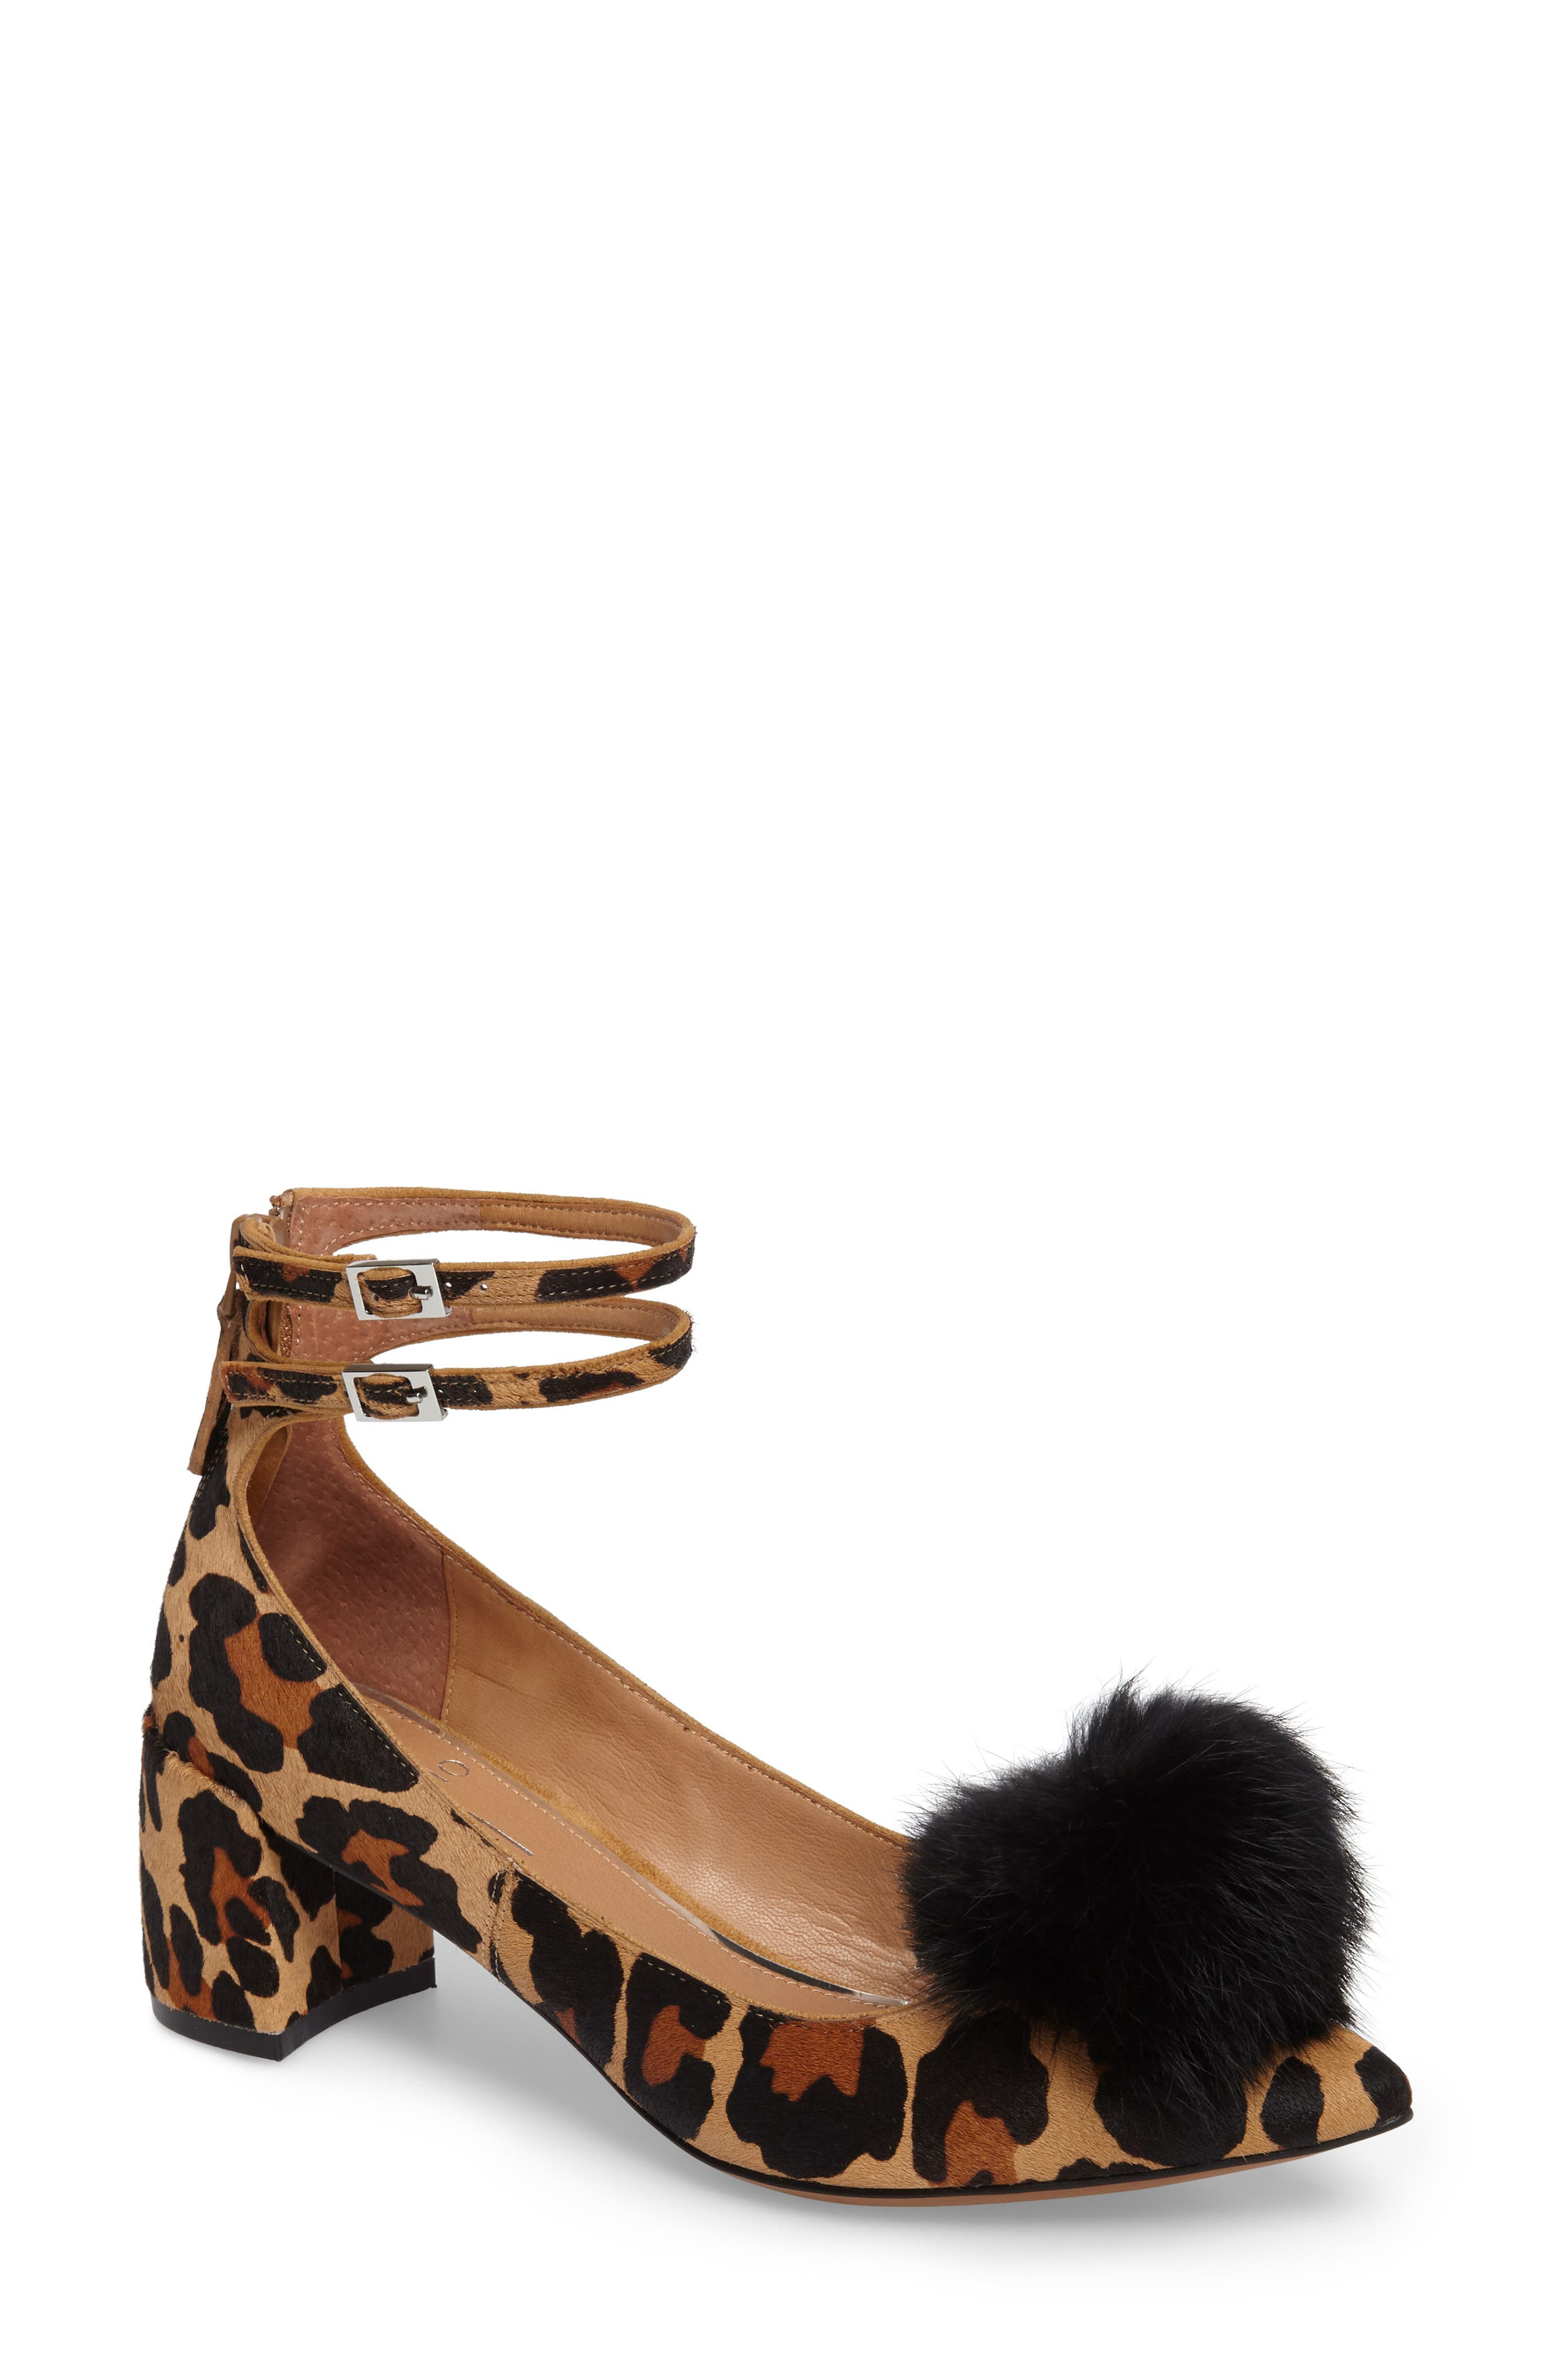 Linea Paolo Nadine II Ankle Strap Pump (Women)